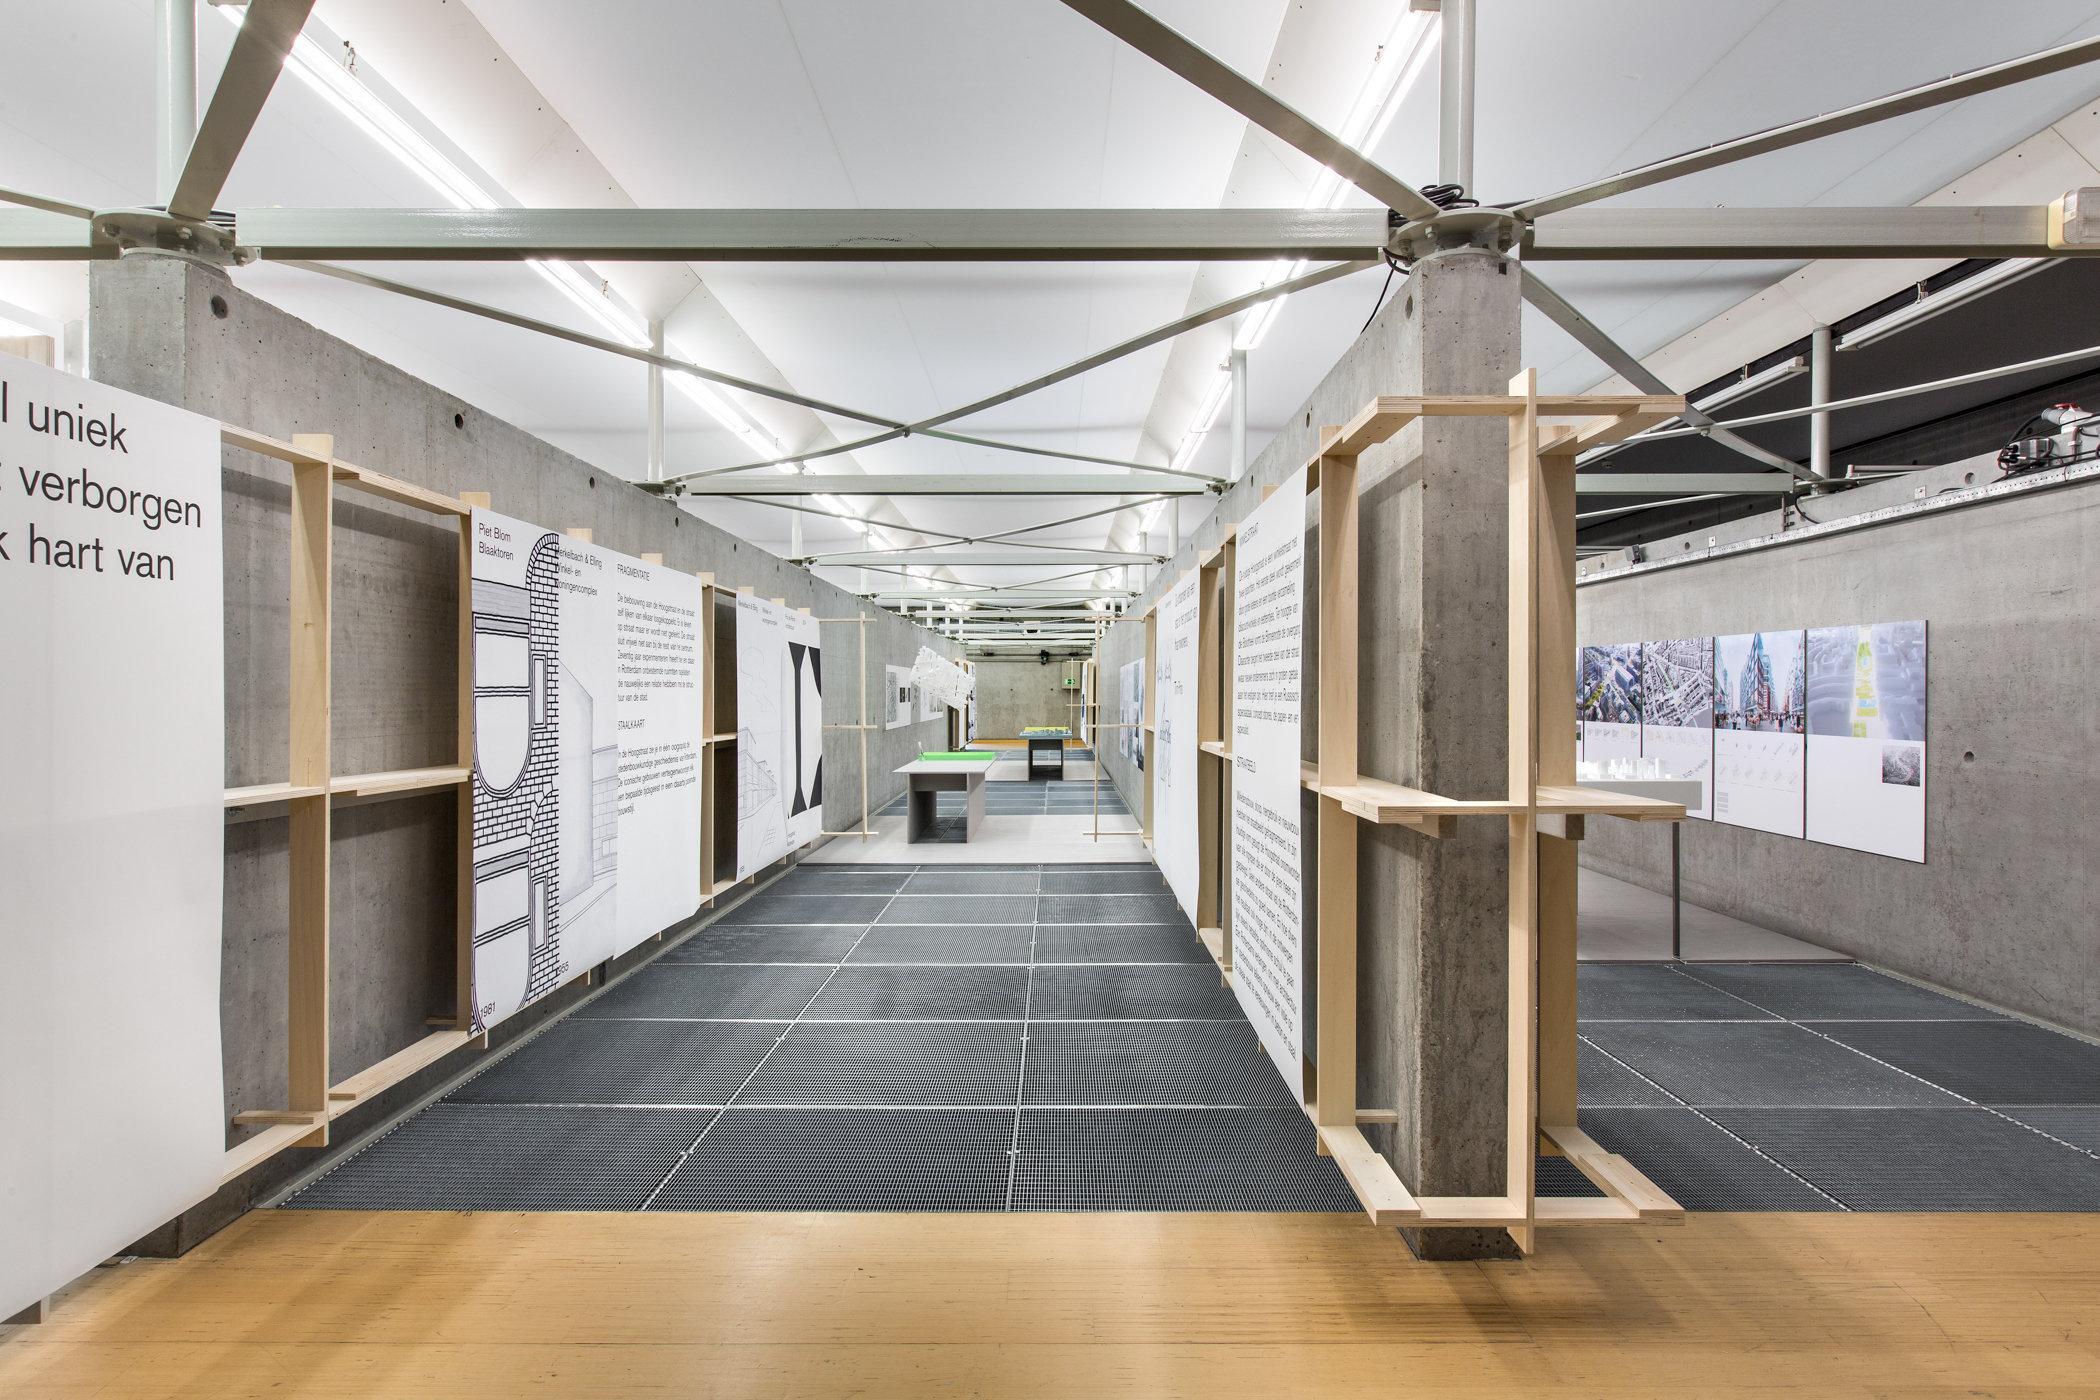 Prix de Rome Architecture 2014 exhibition in Het Nieuwe Instituut, Rotterdam